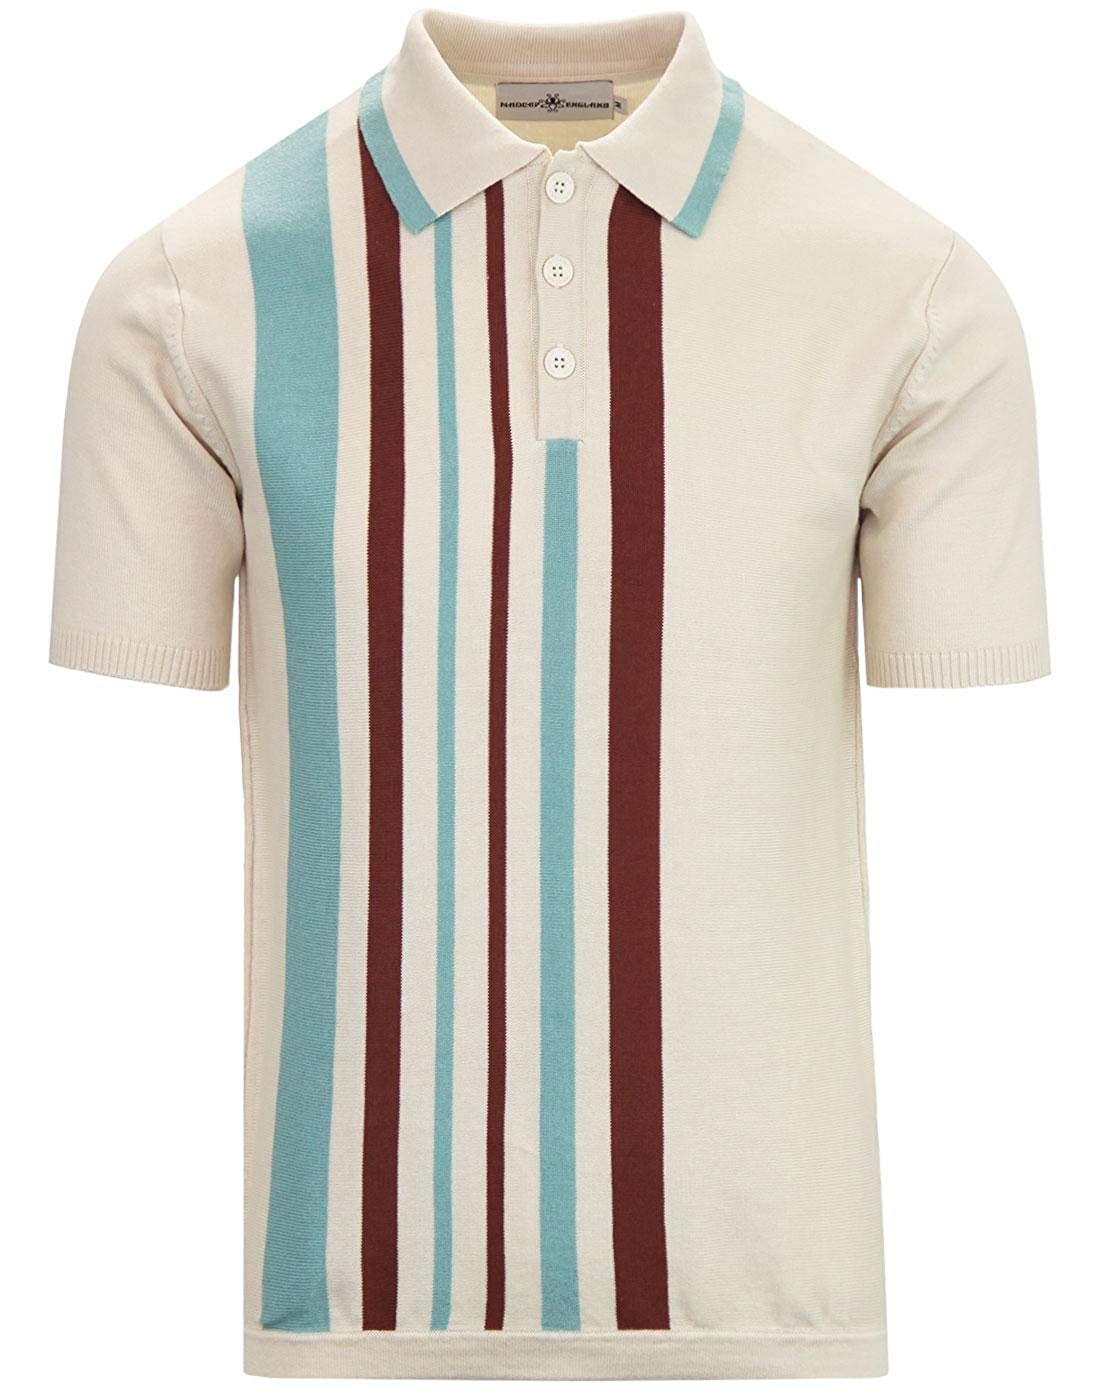 1960s – 70s Mens Shirts- Disco Shirts, Hippie Shirts Madcap England Bauhaus Mens Mod 50s 60s Style Knitted Polo Shirt £34.99 AT vintagedancer.com